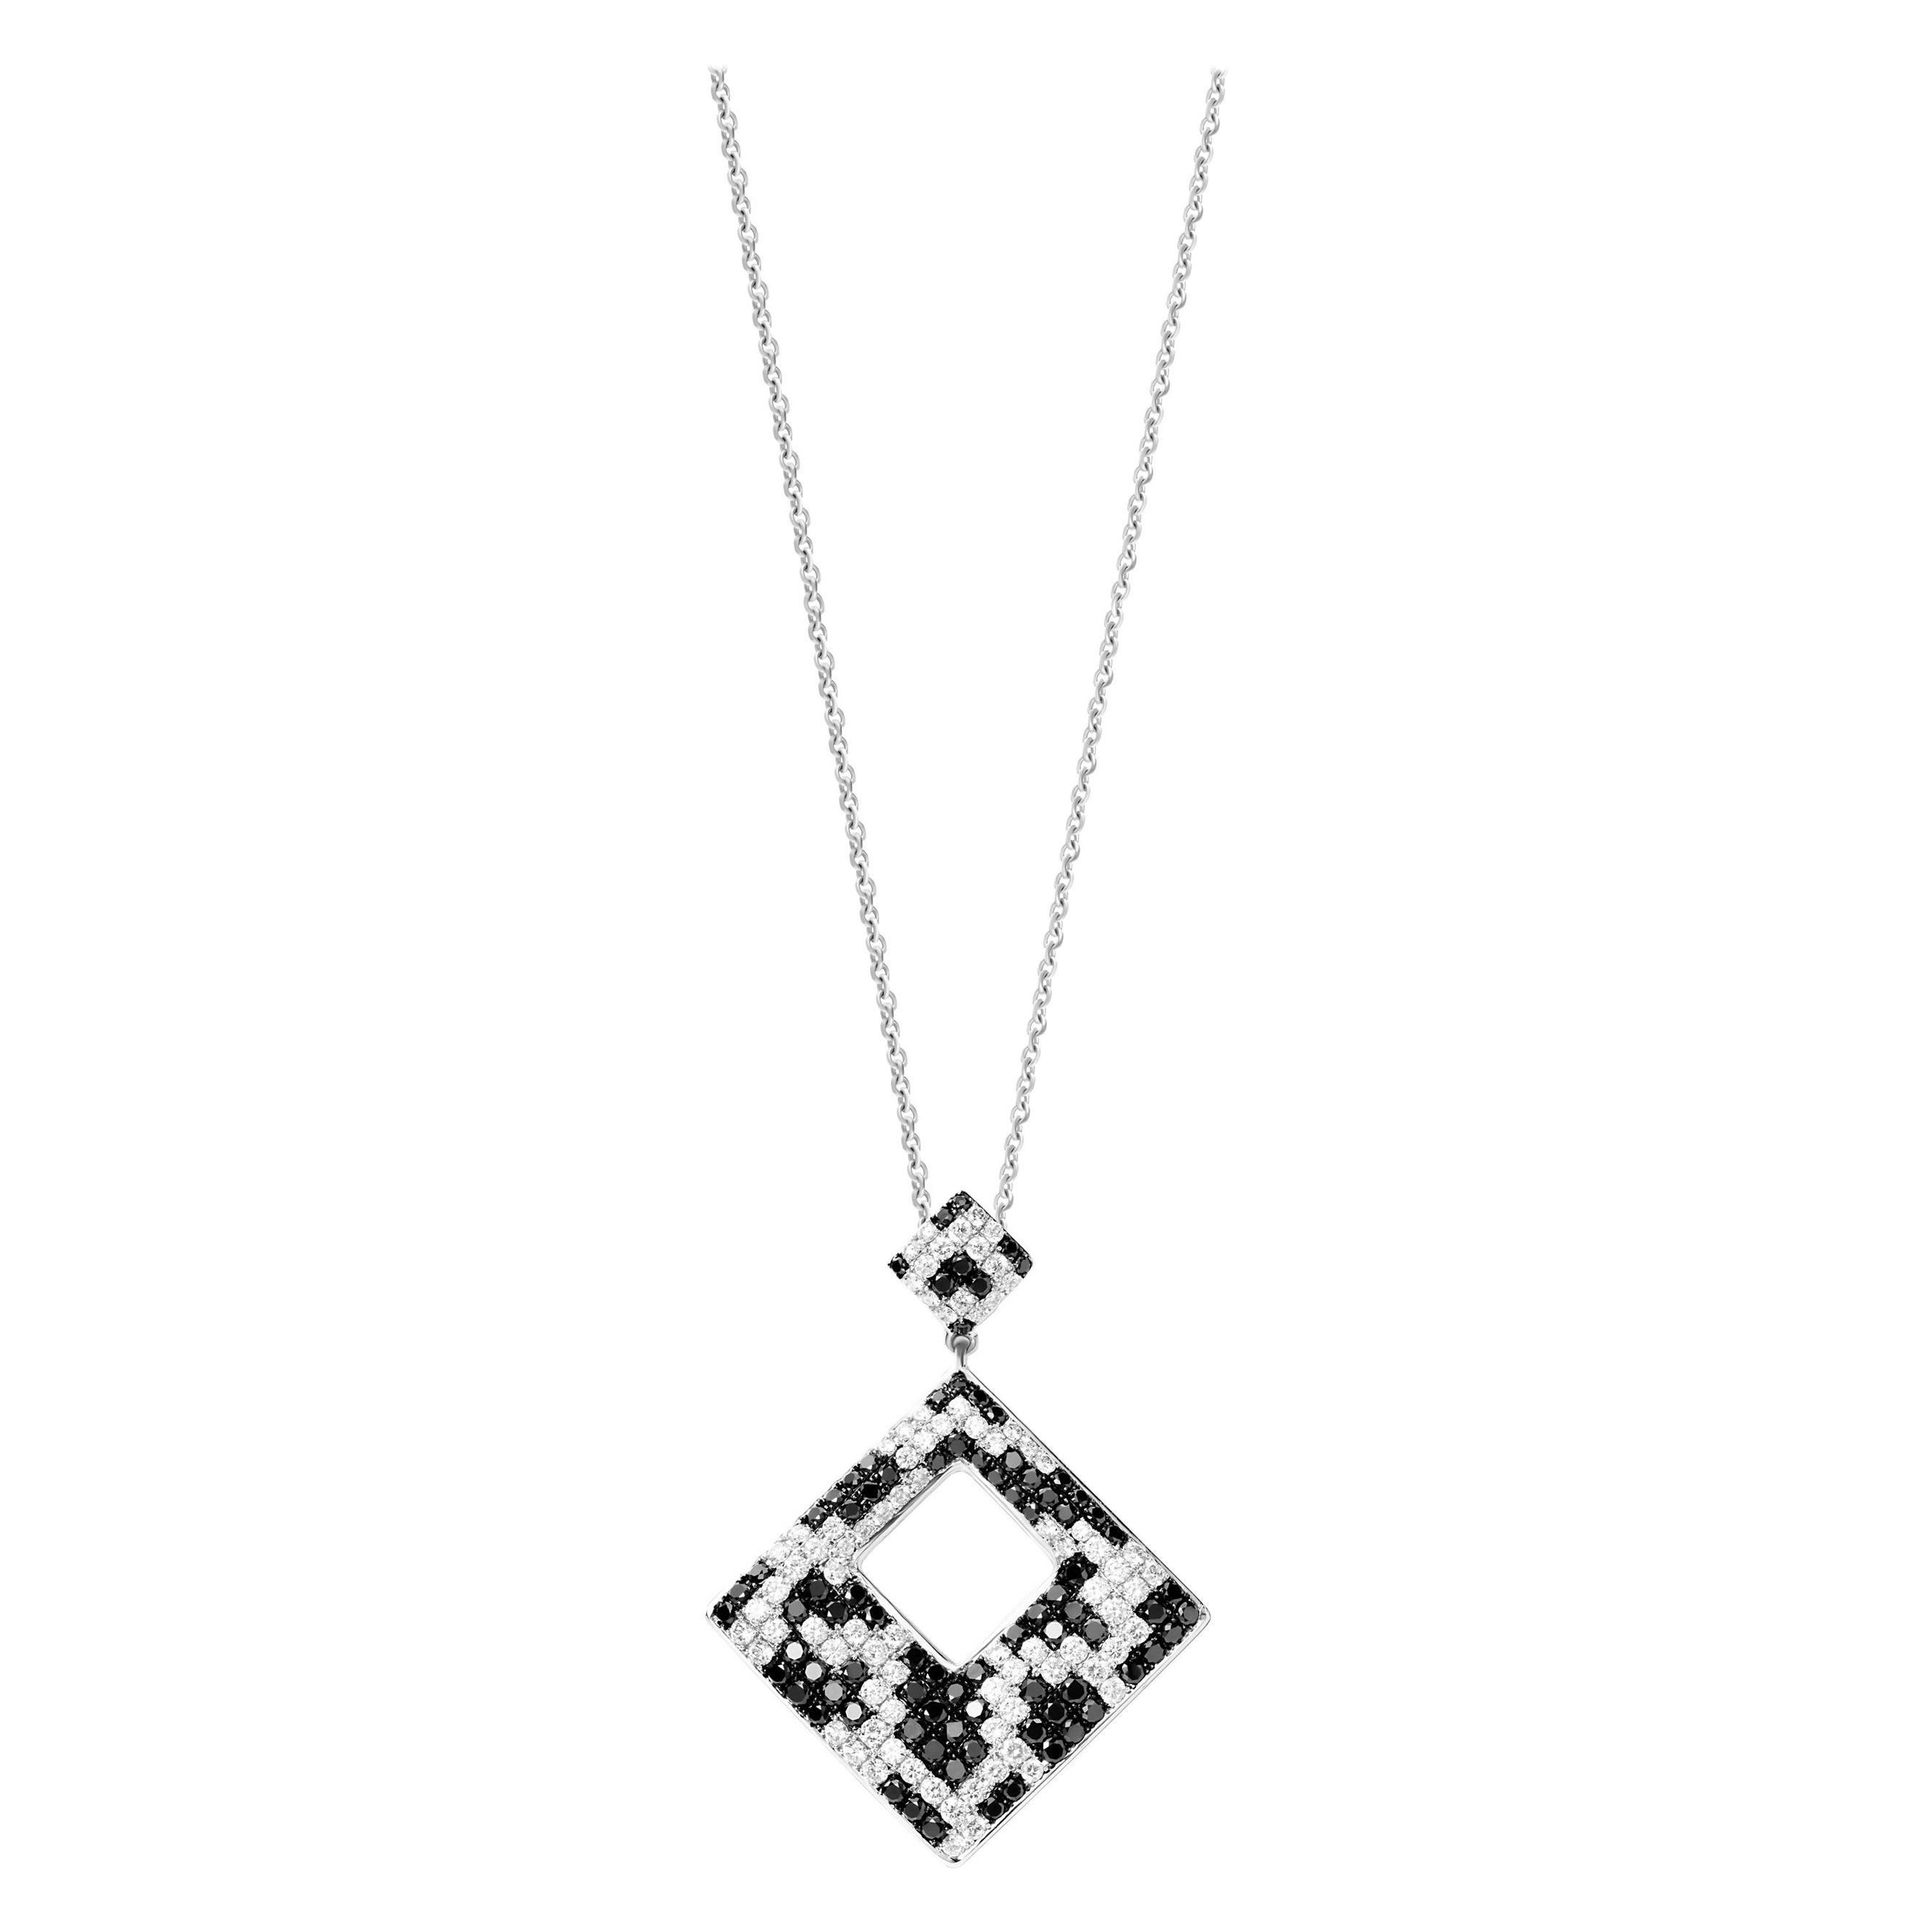 2.94 Carat Black White Diamond 18 Karat White Gold Pendant Necklace